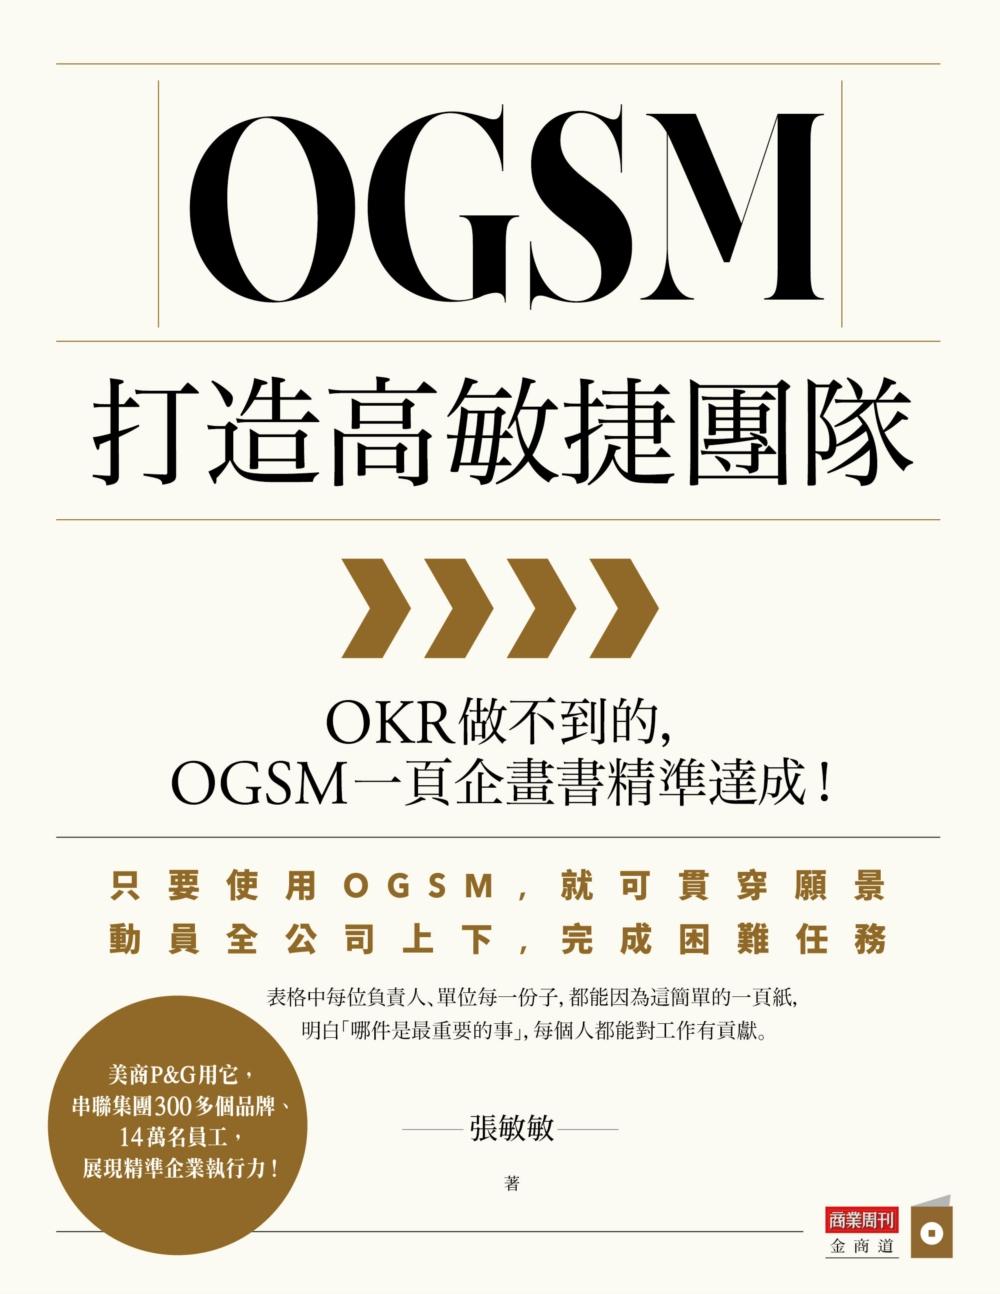 OGSM打造高敏捷團隊:OKR做不到的,OGSM一頁企畫書精準達成!